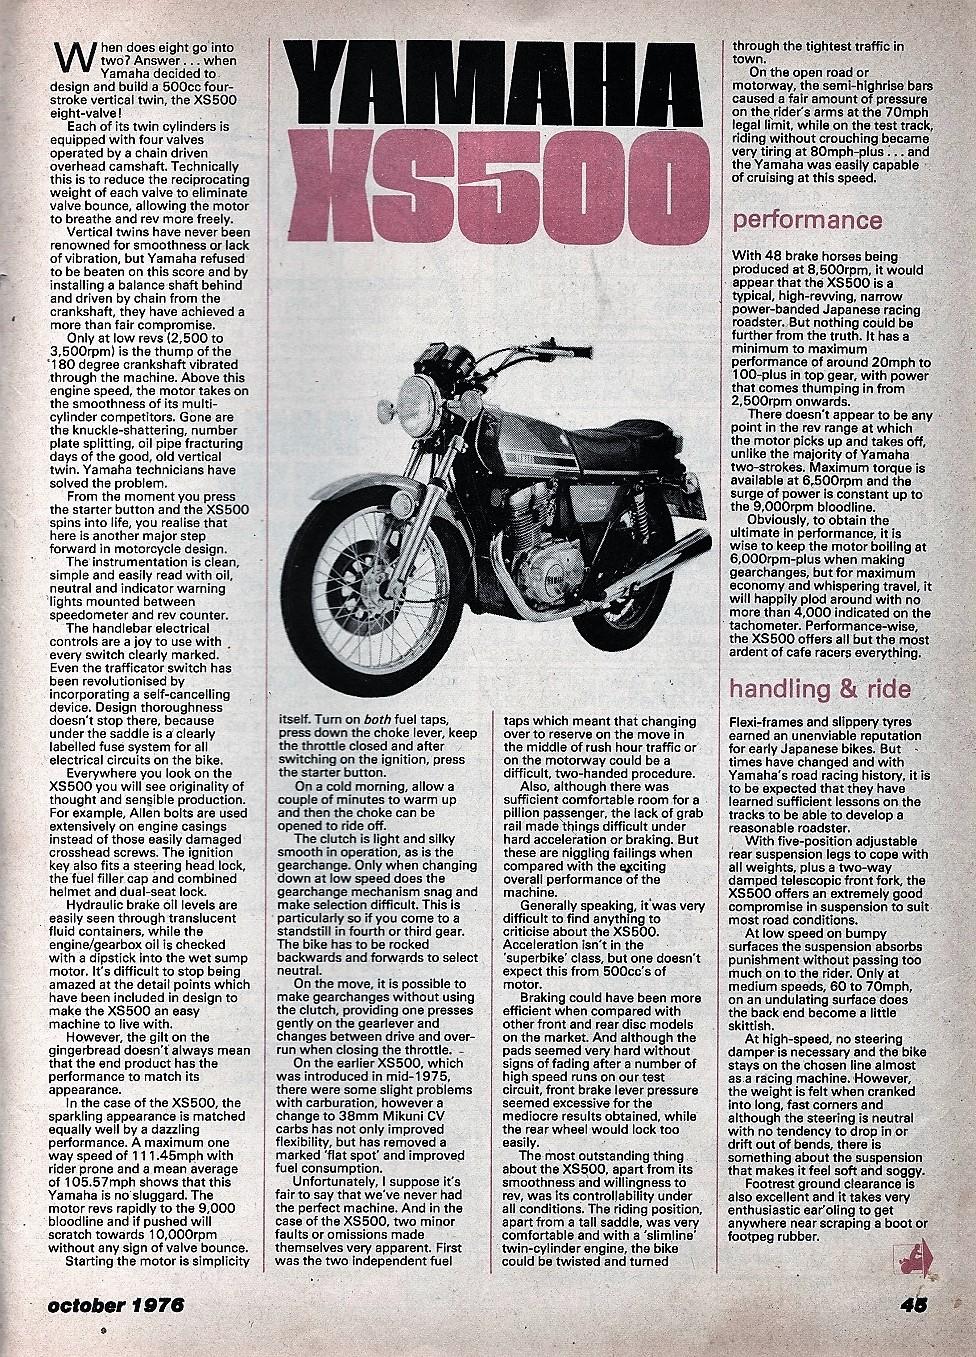 1976 Yamaha XS500 road test.2.jpg